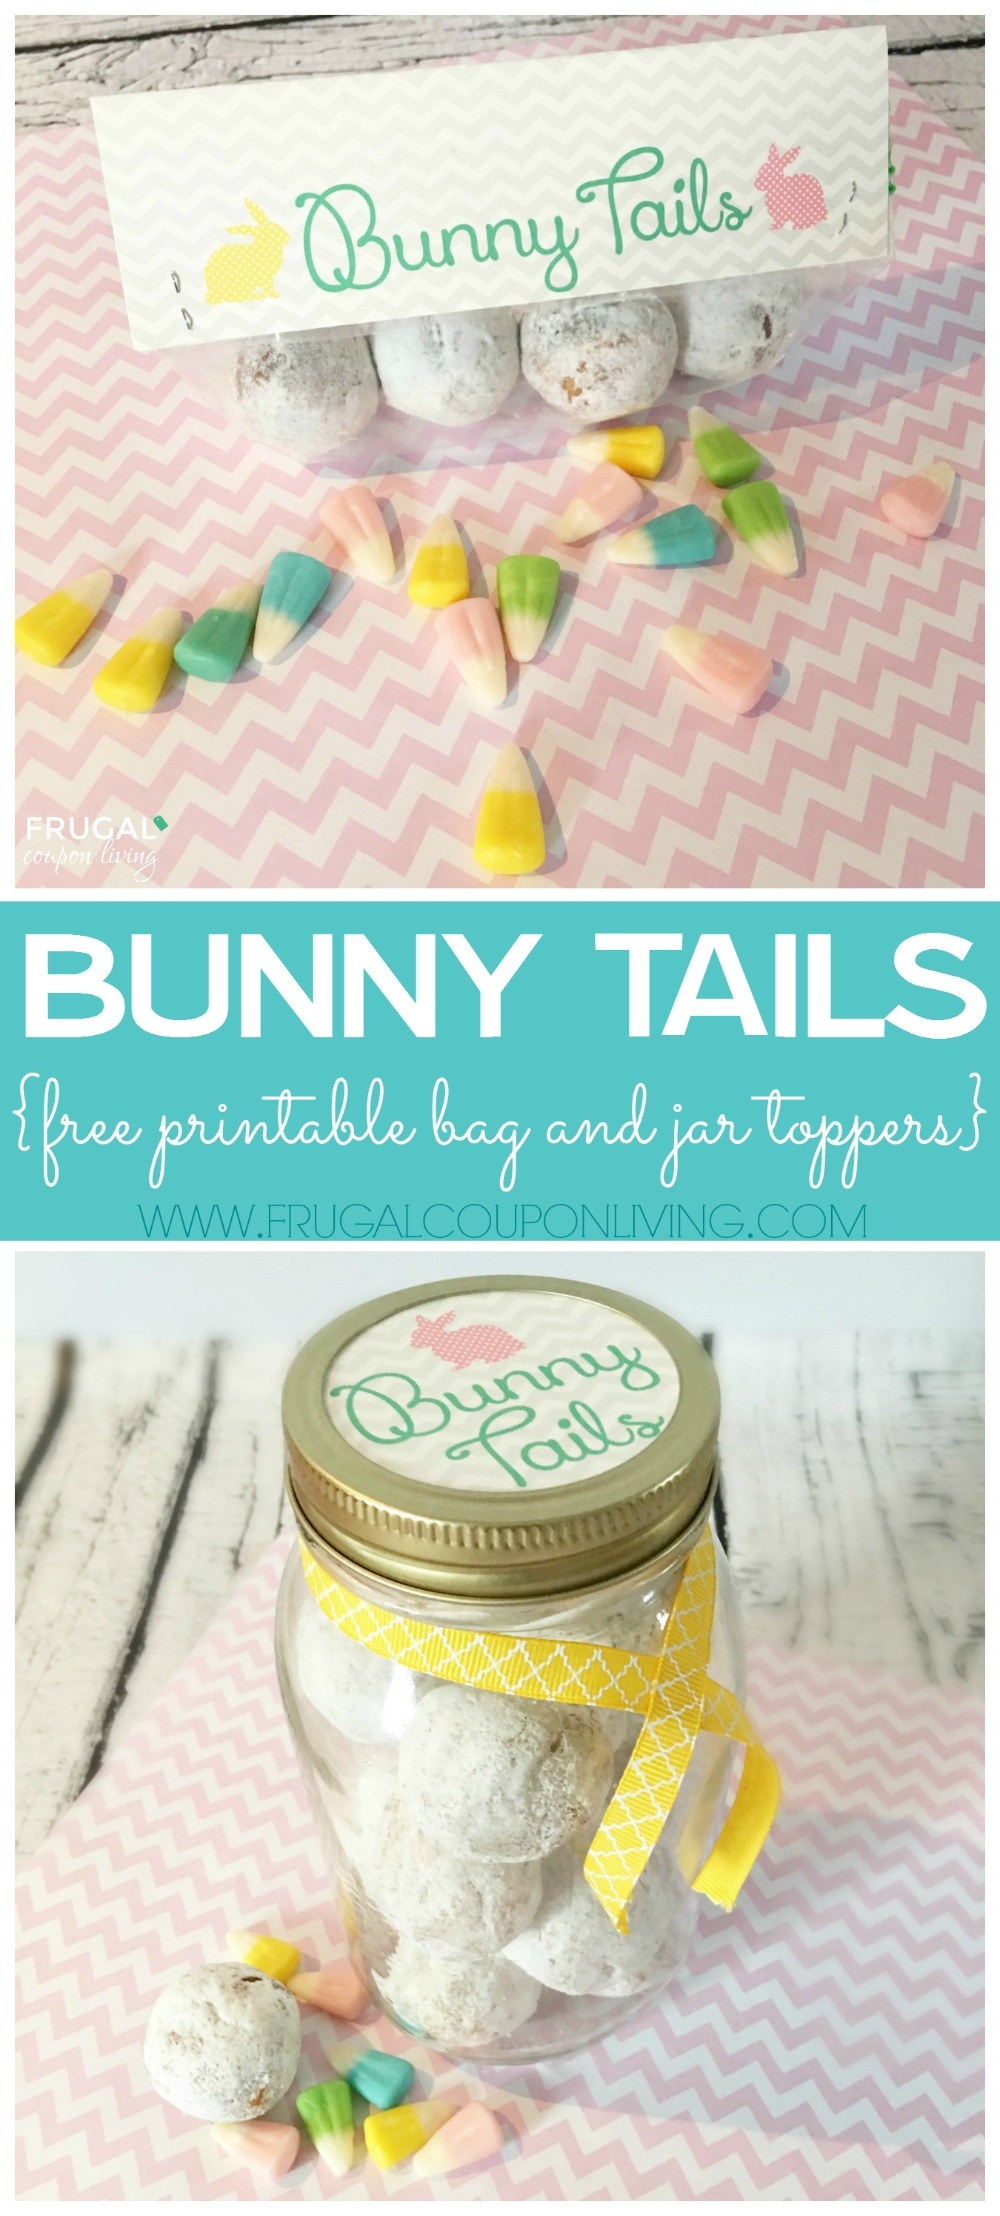 Bunny-Tails-Printable-Jar-Bag-Topper-Frugal-Coupon-Living